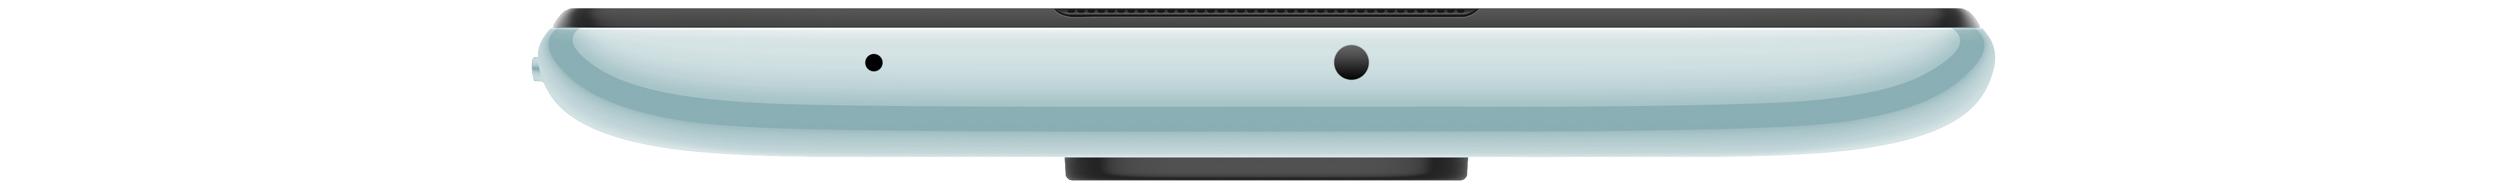 Redmi Note 9 okostelefon (Global) - 3+64GB, Polar White